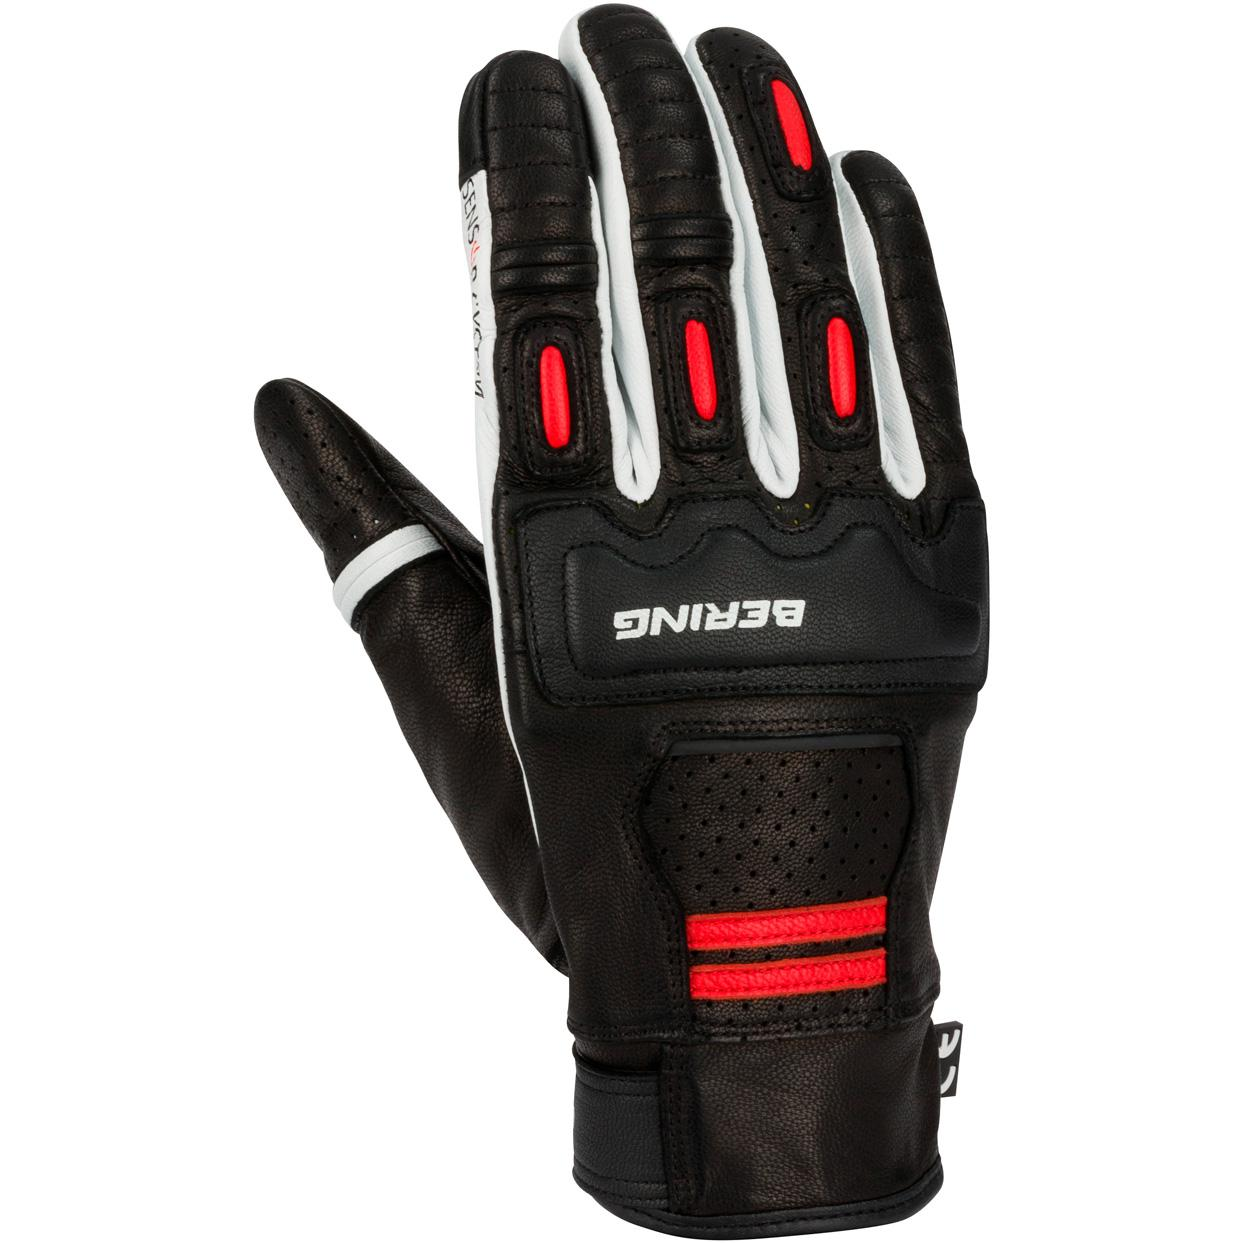 BERING-gants-alfred-image-10685717